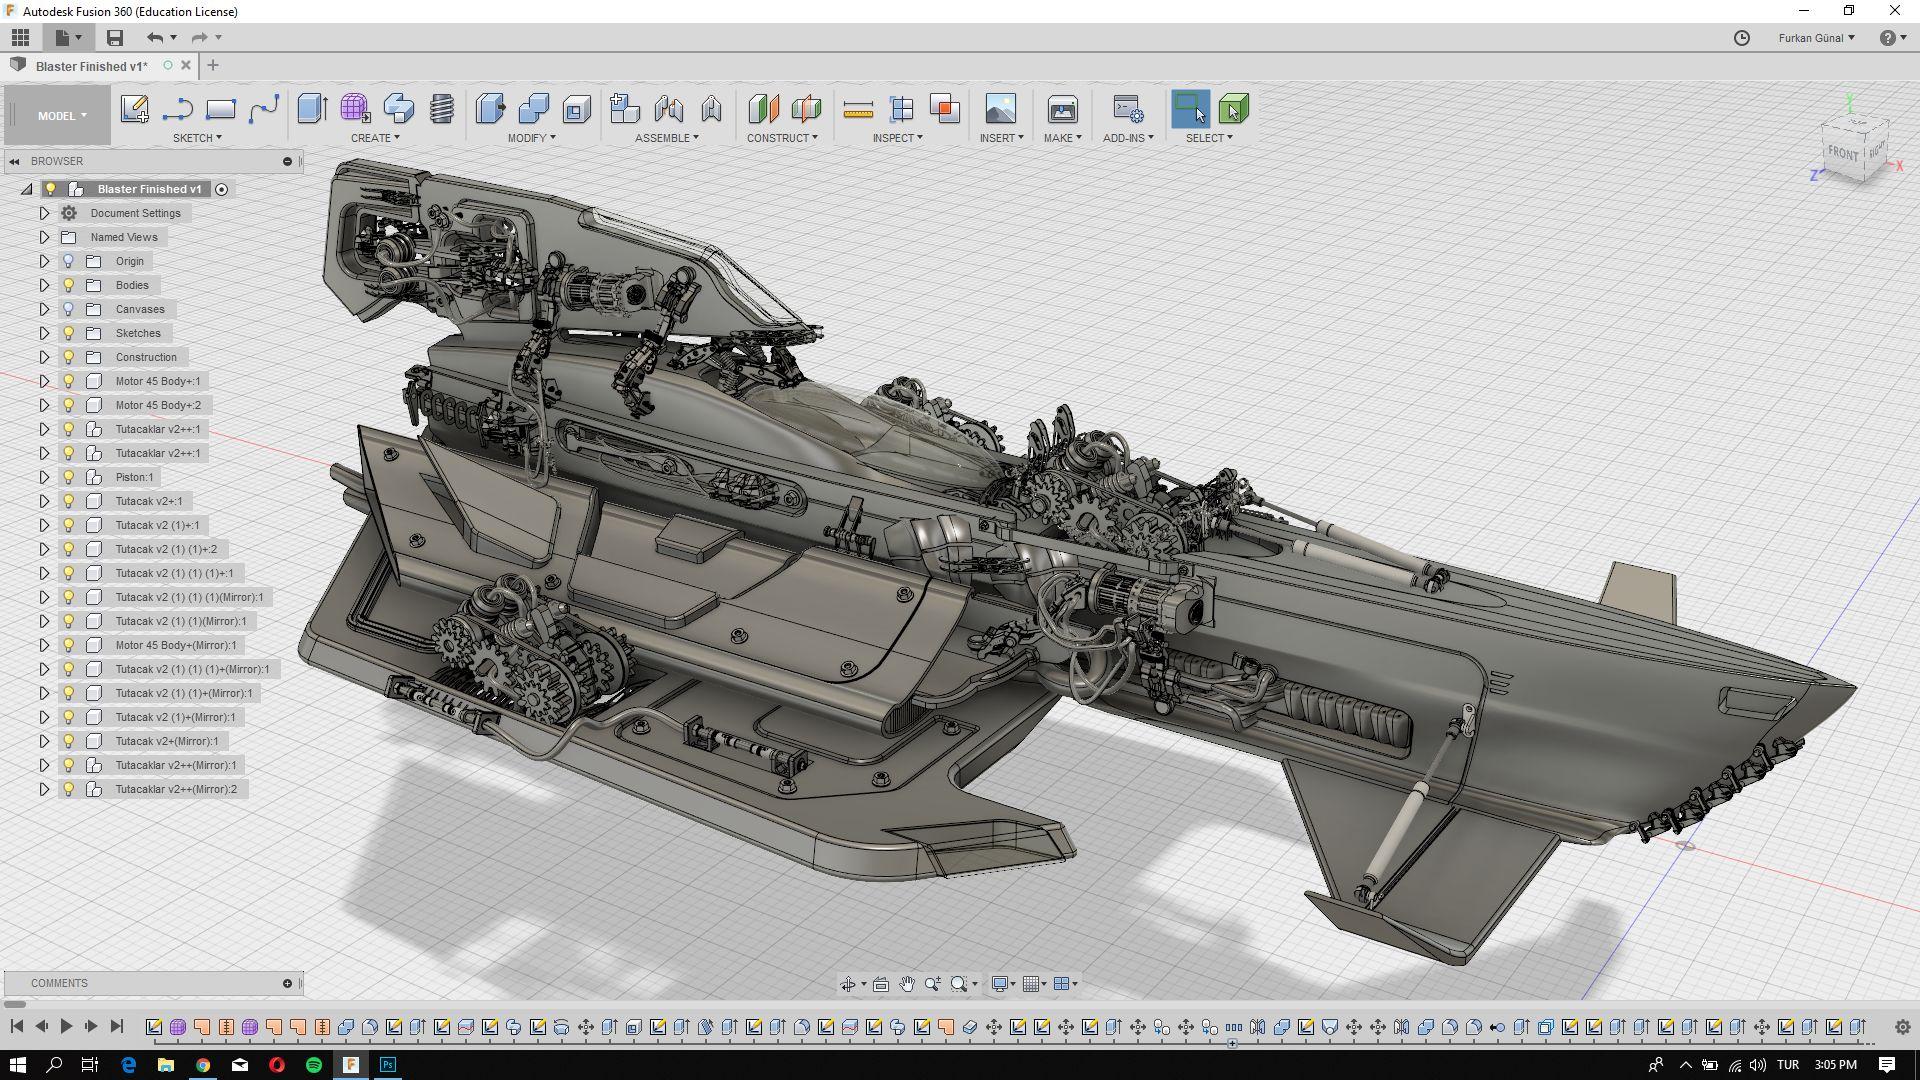 Speeder-fusion-360-scene-1-3500-3500